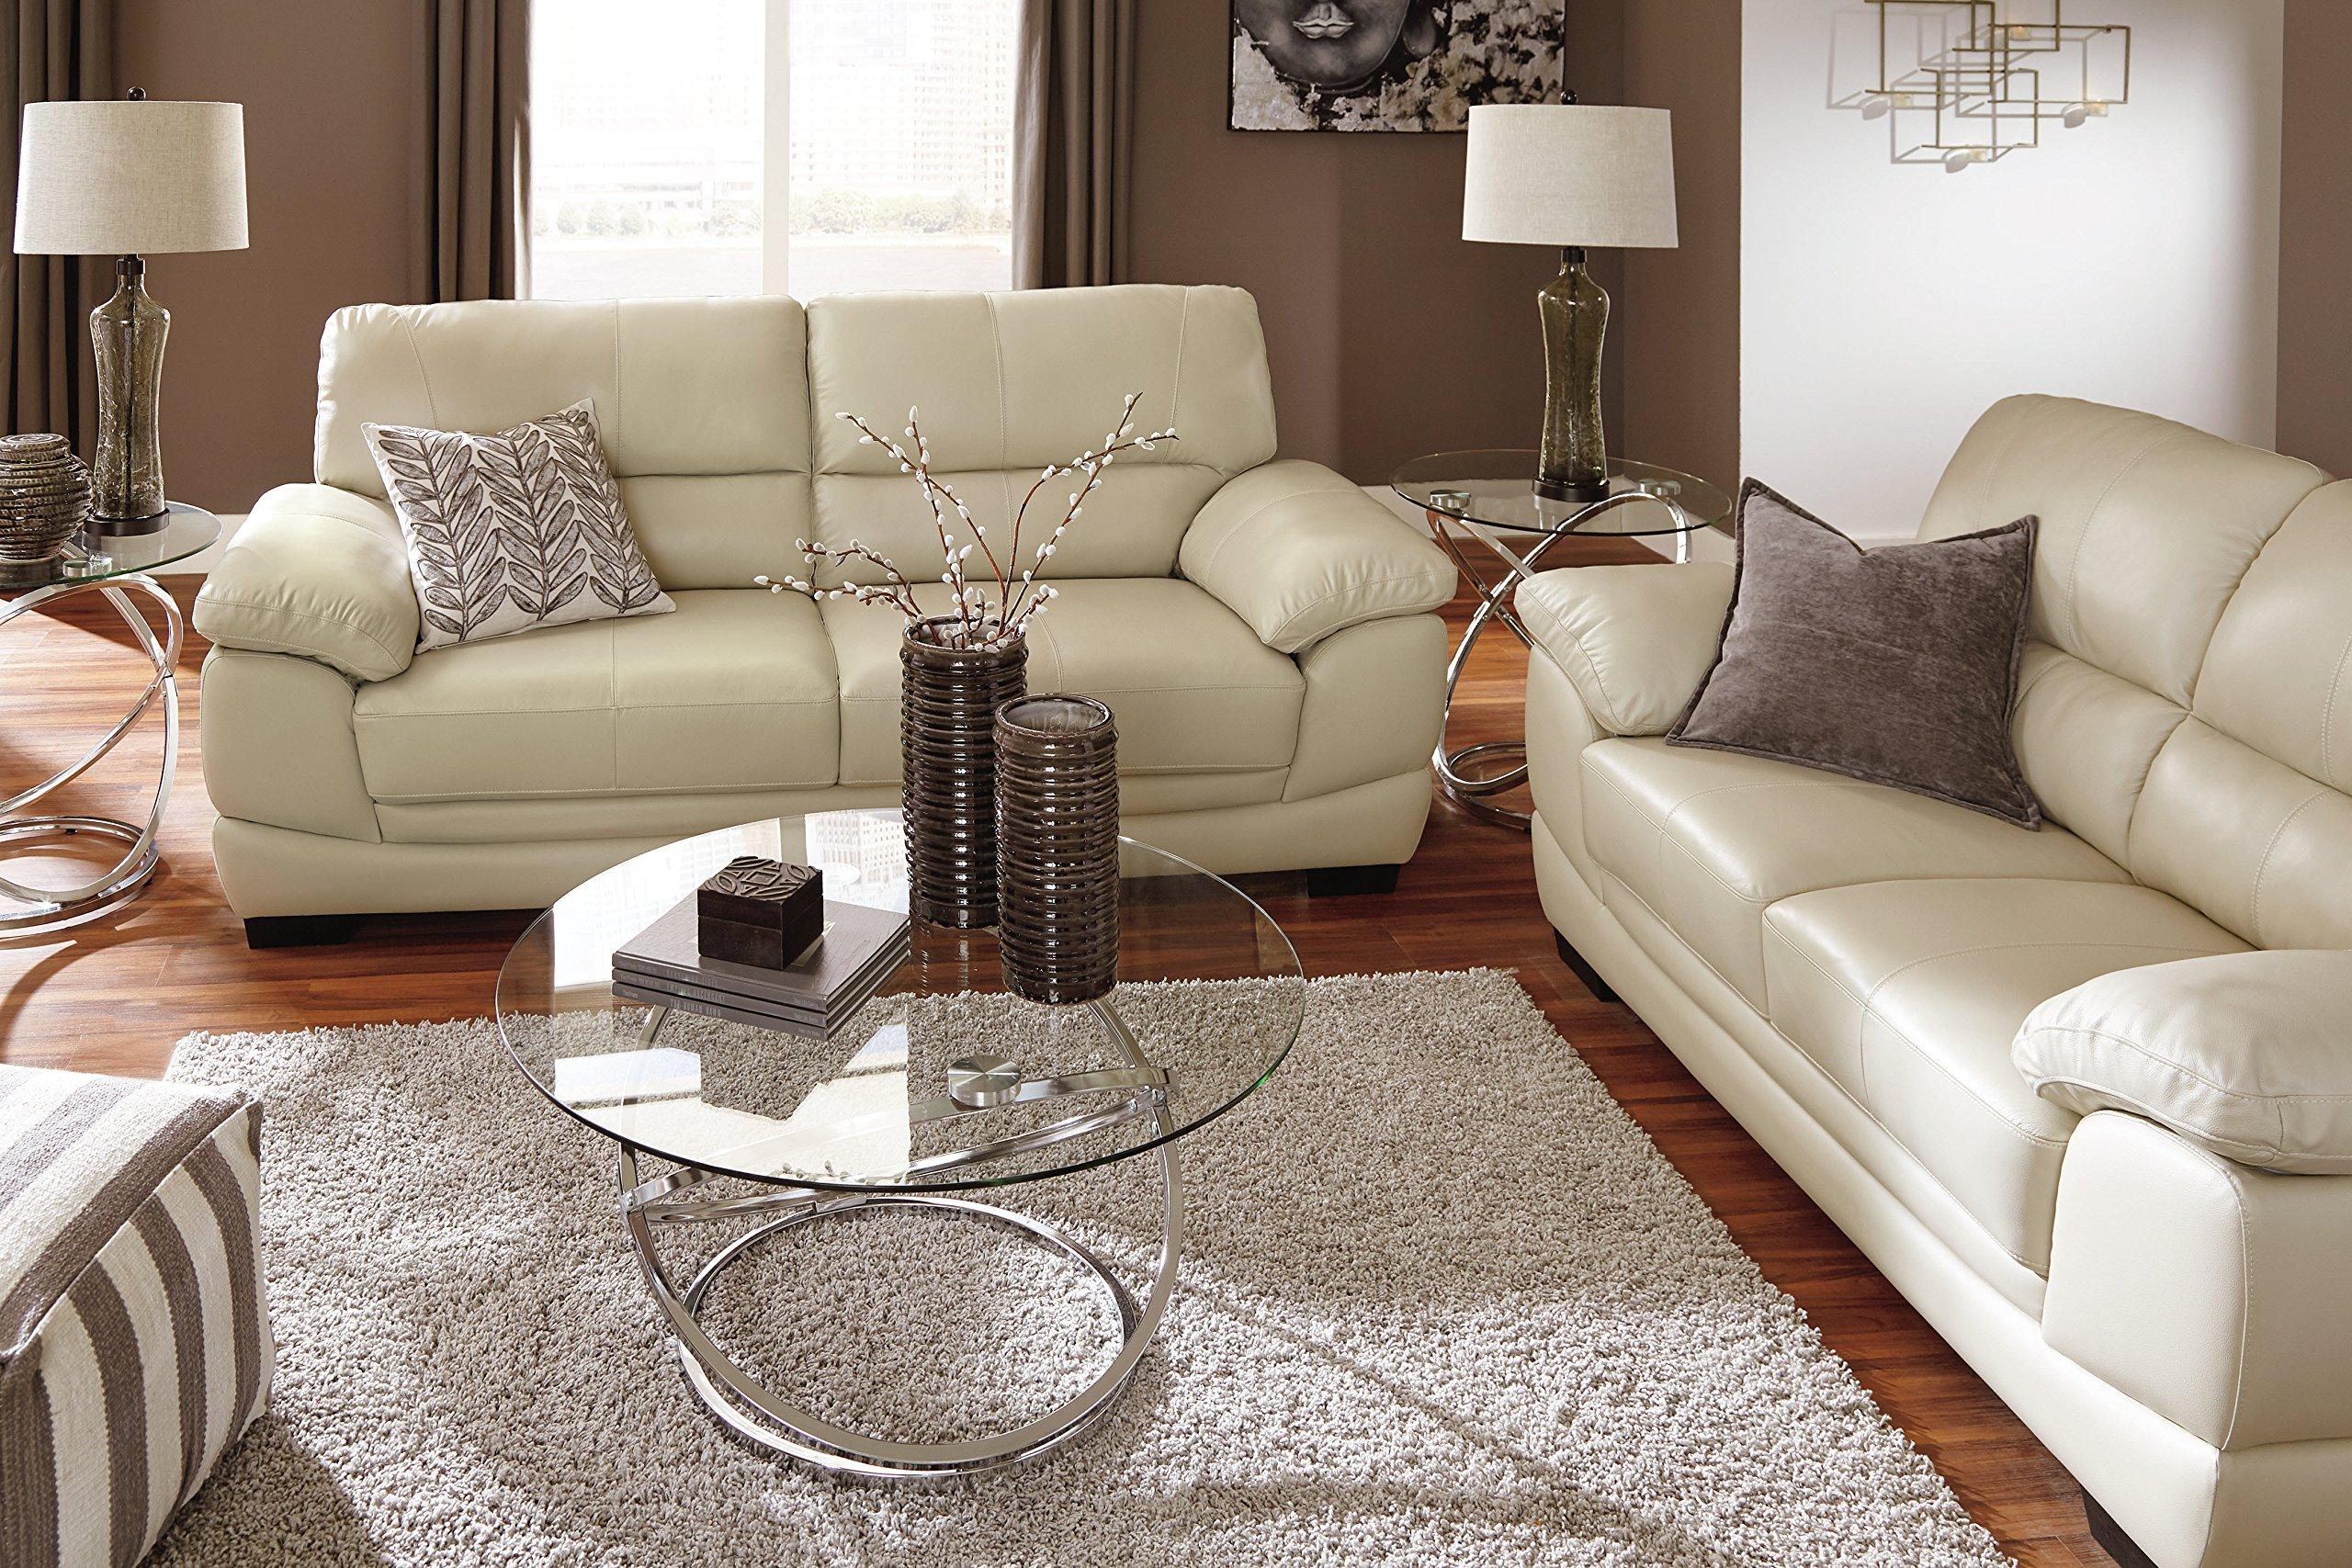 Ashley Furniture Signature Design - Irene Throw Pillow - Contemporary - Charcoal Velvet